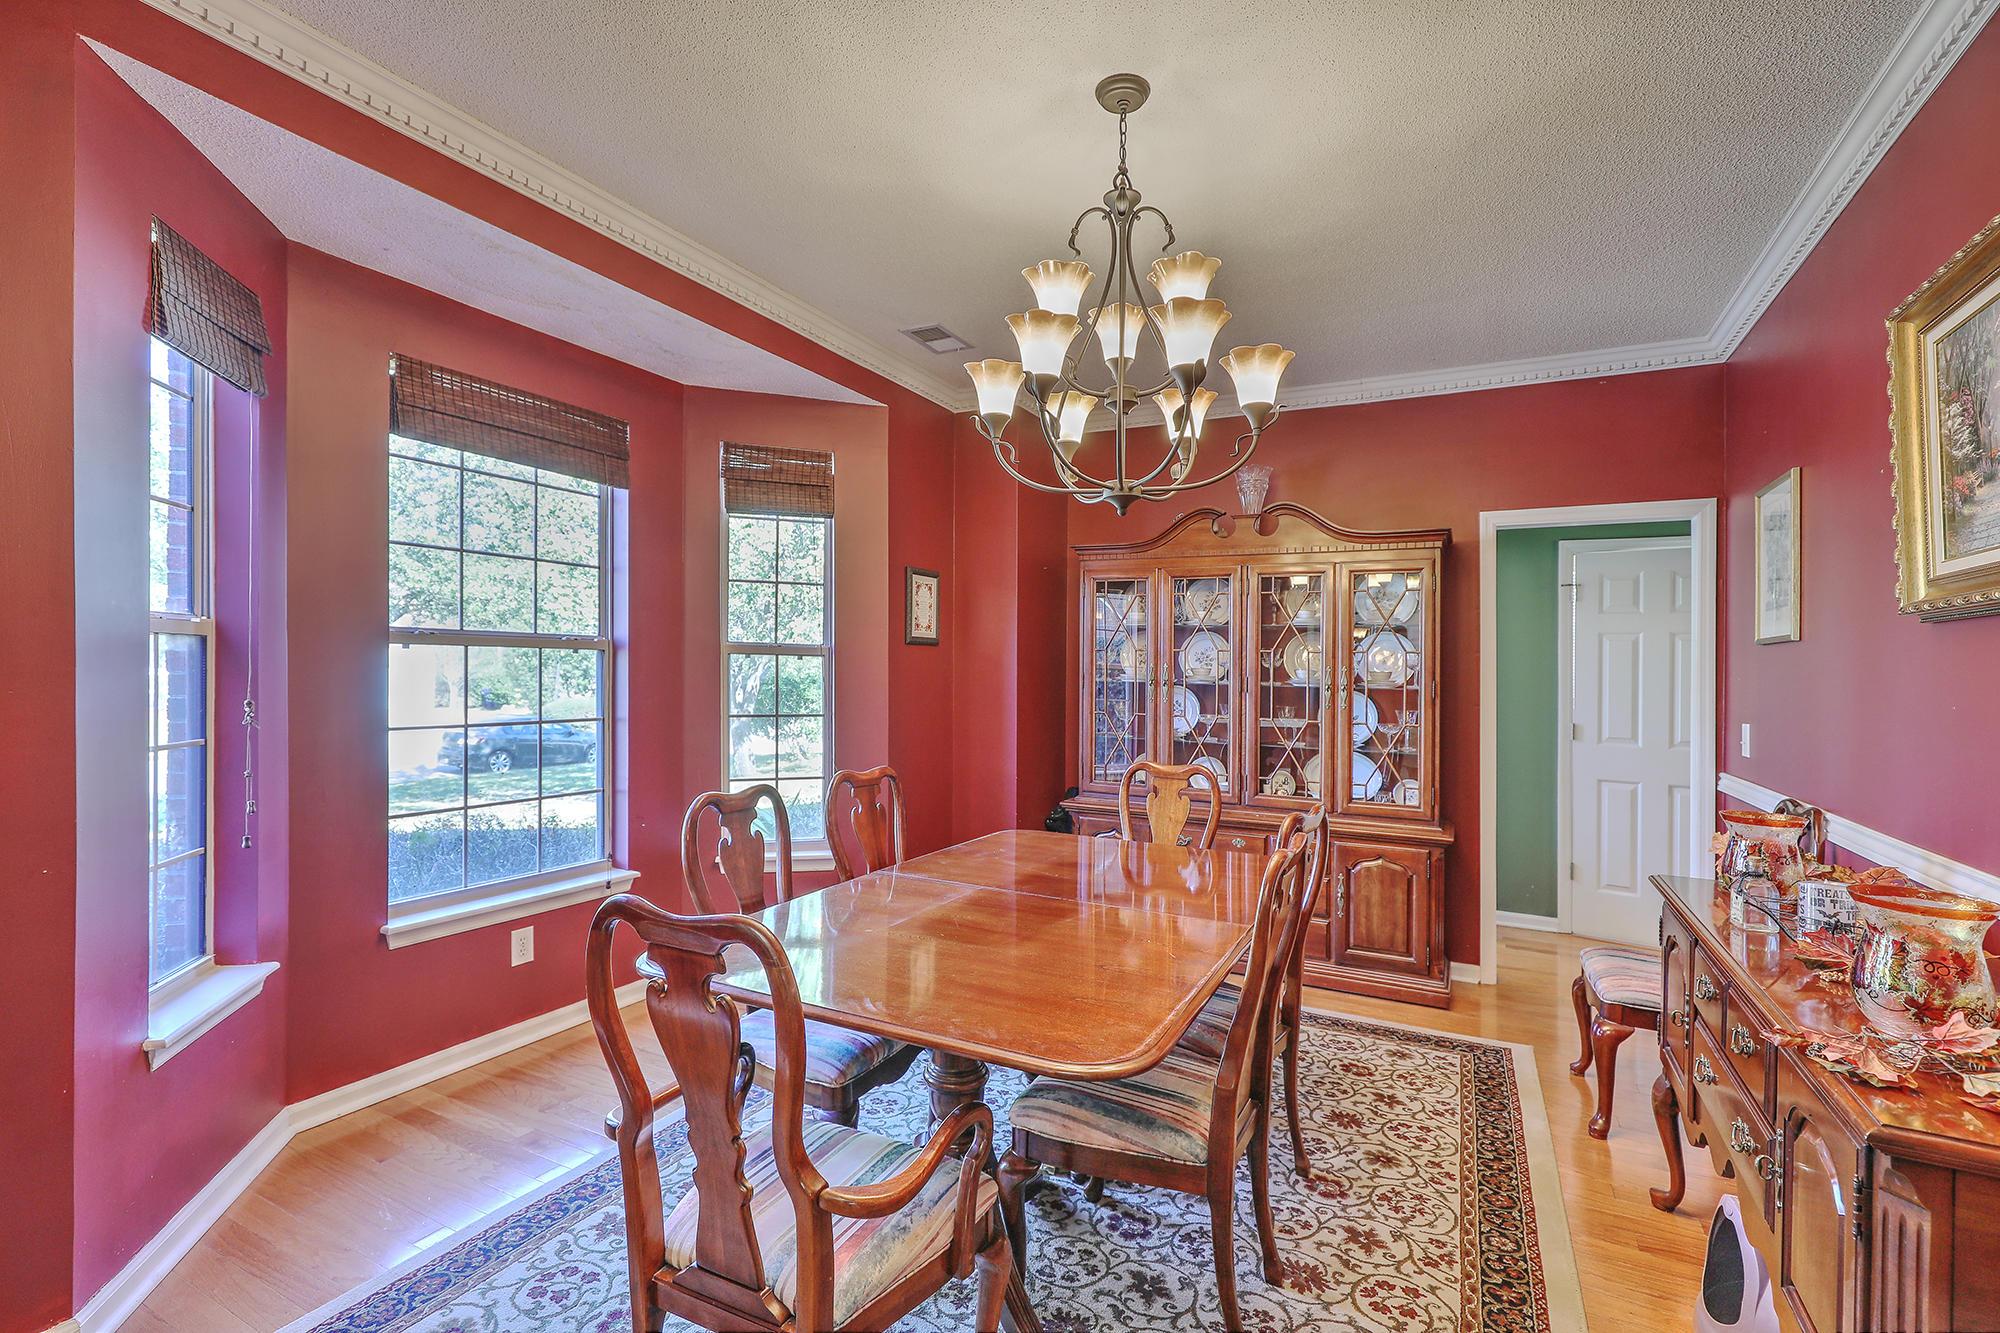 Home for sale 369 Antebellum Lane, Belle Hall, Mt. Pleasant, SC